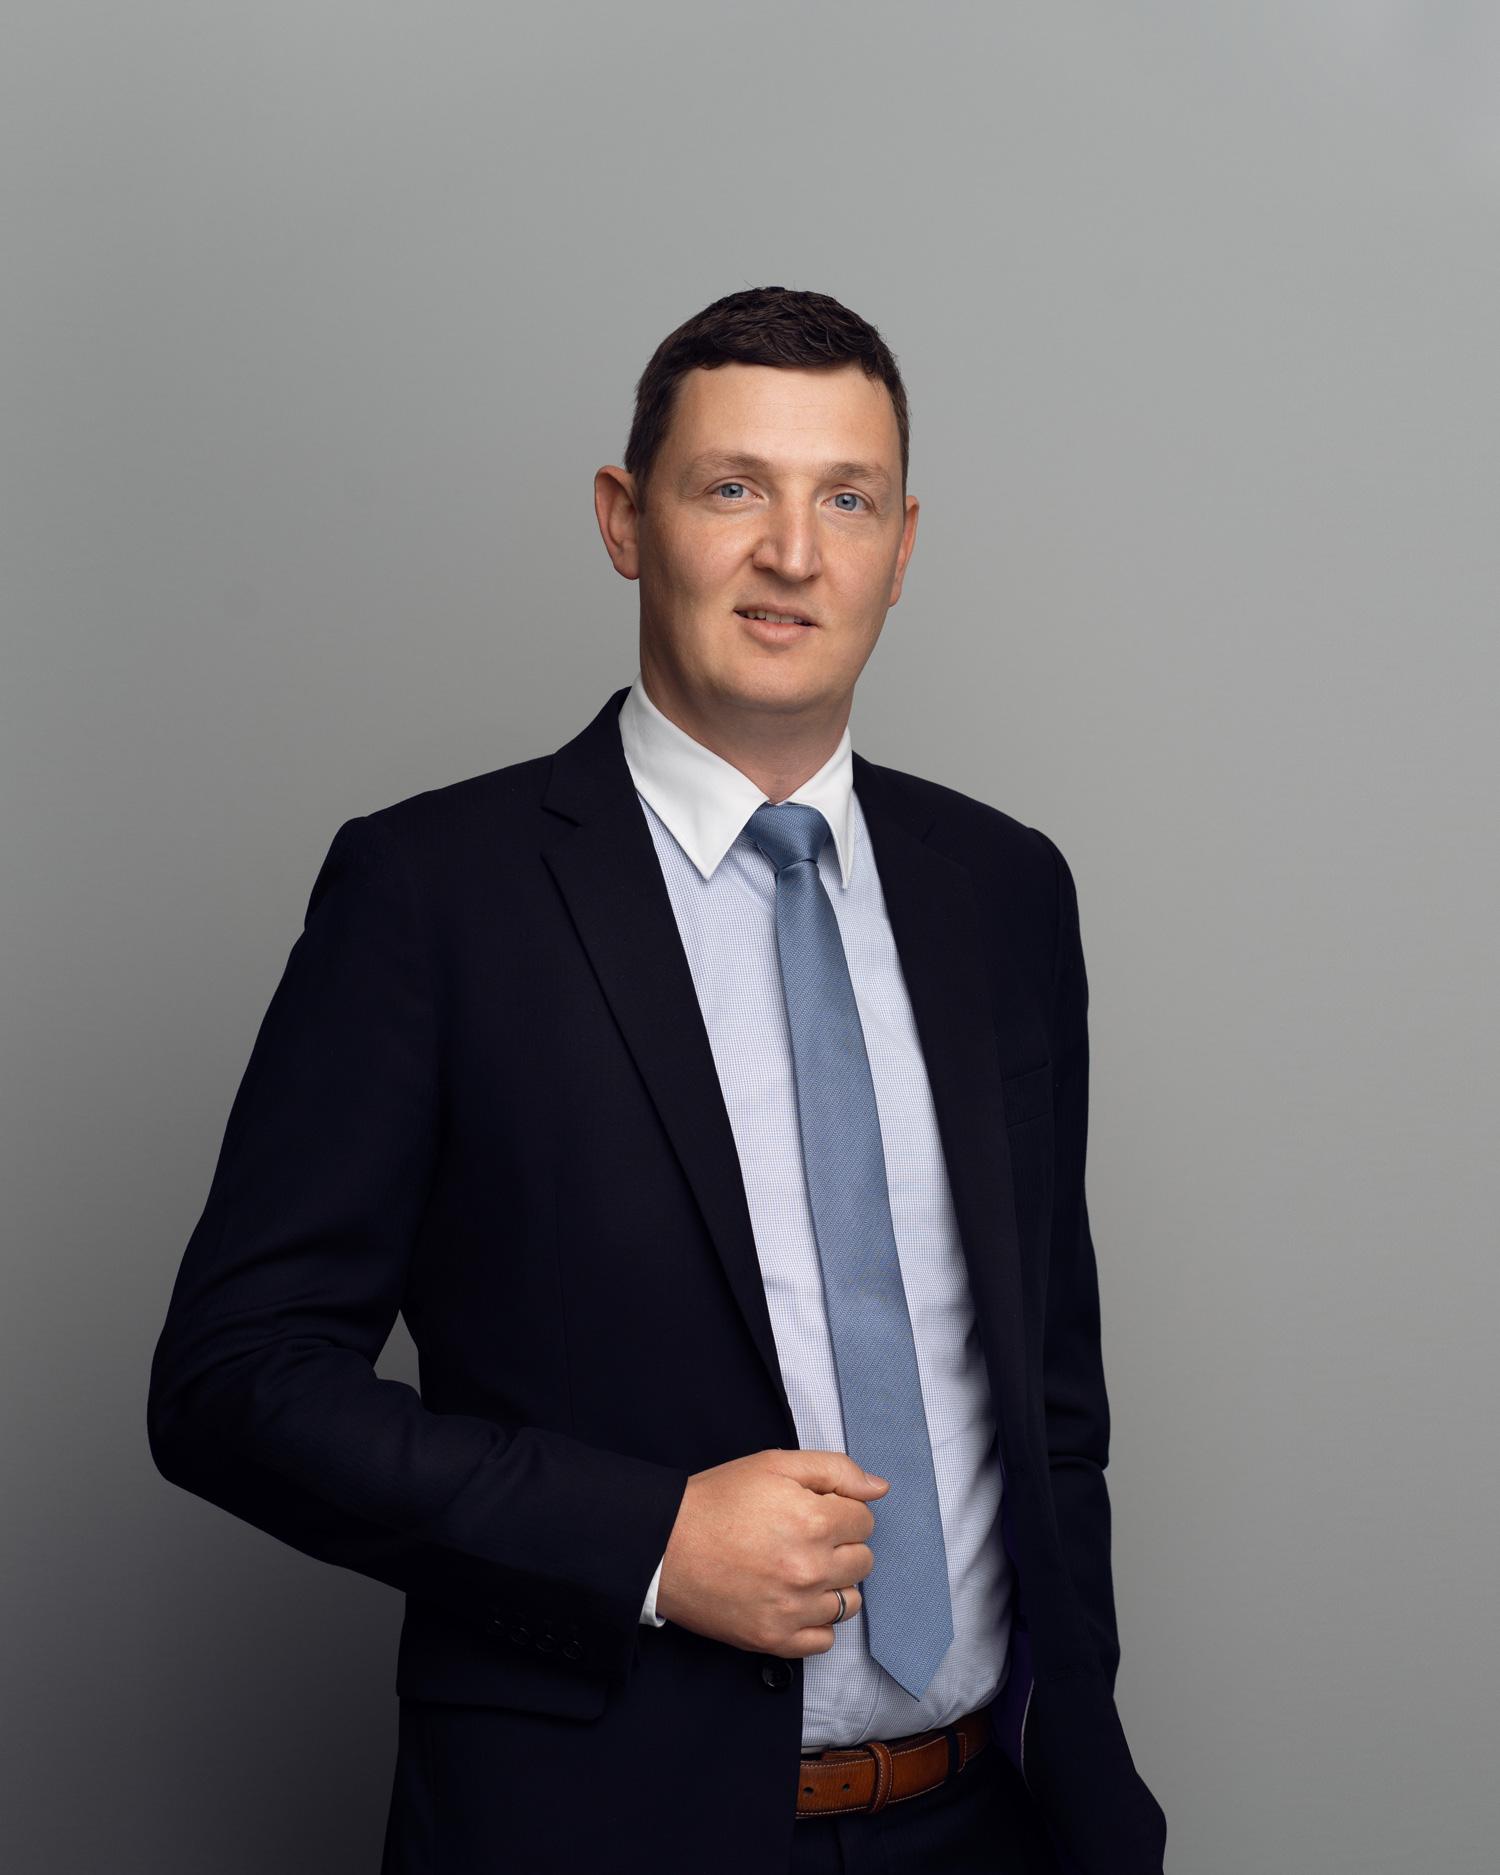 Christoph Cranz, Wohnbau Bergstrasse eG, Geschäftsbericht 2020, Friedemann Hertrampf